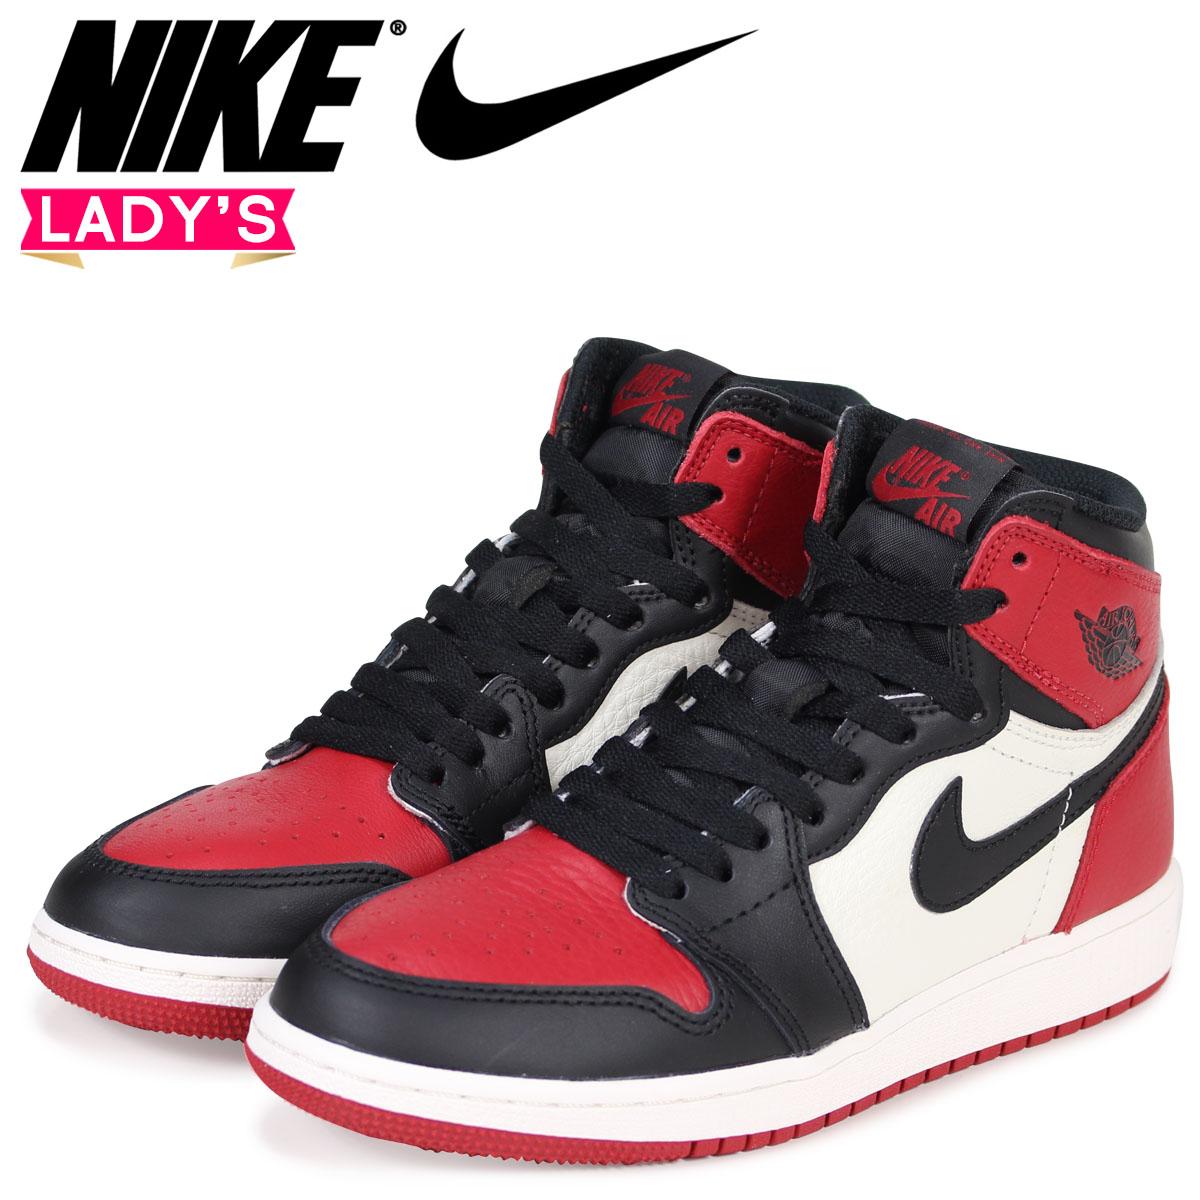 NIKE Nike Air Jordan 1 nostalgic Haile Dis sneakers AIR JORDAN 1 RETRO HIGH  OG BG BRED TOE 575 e0f3fc1bd